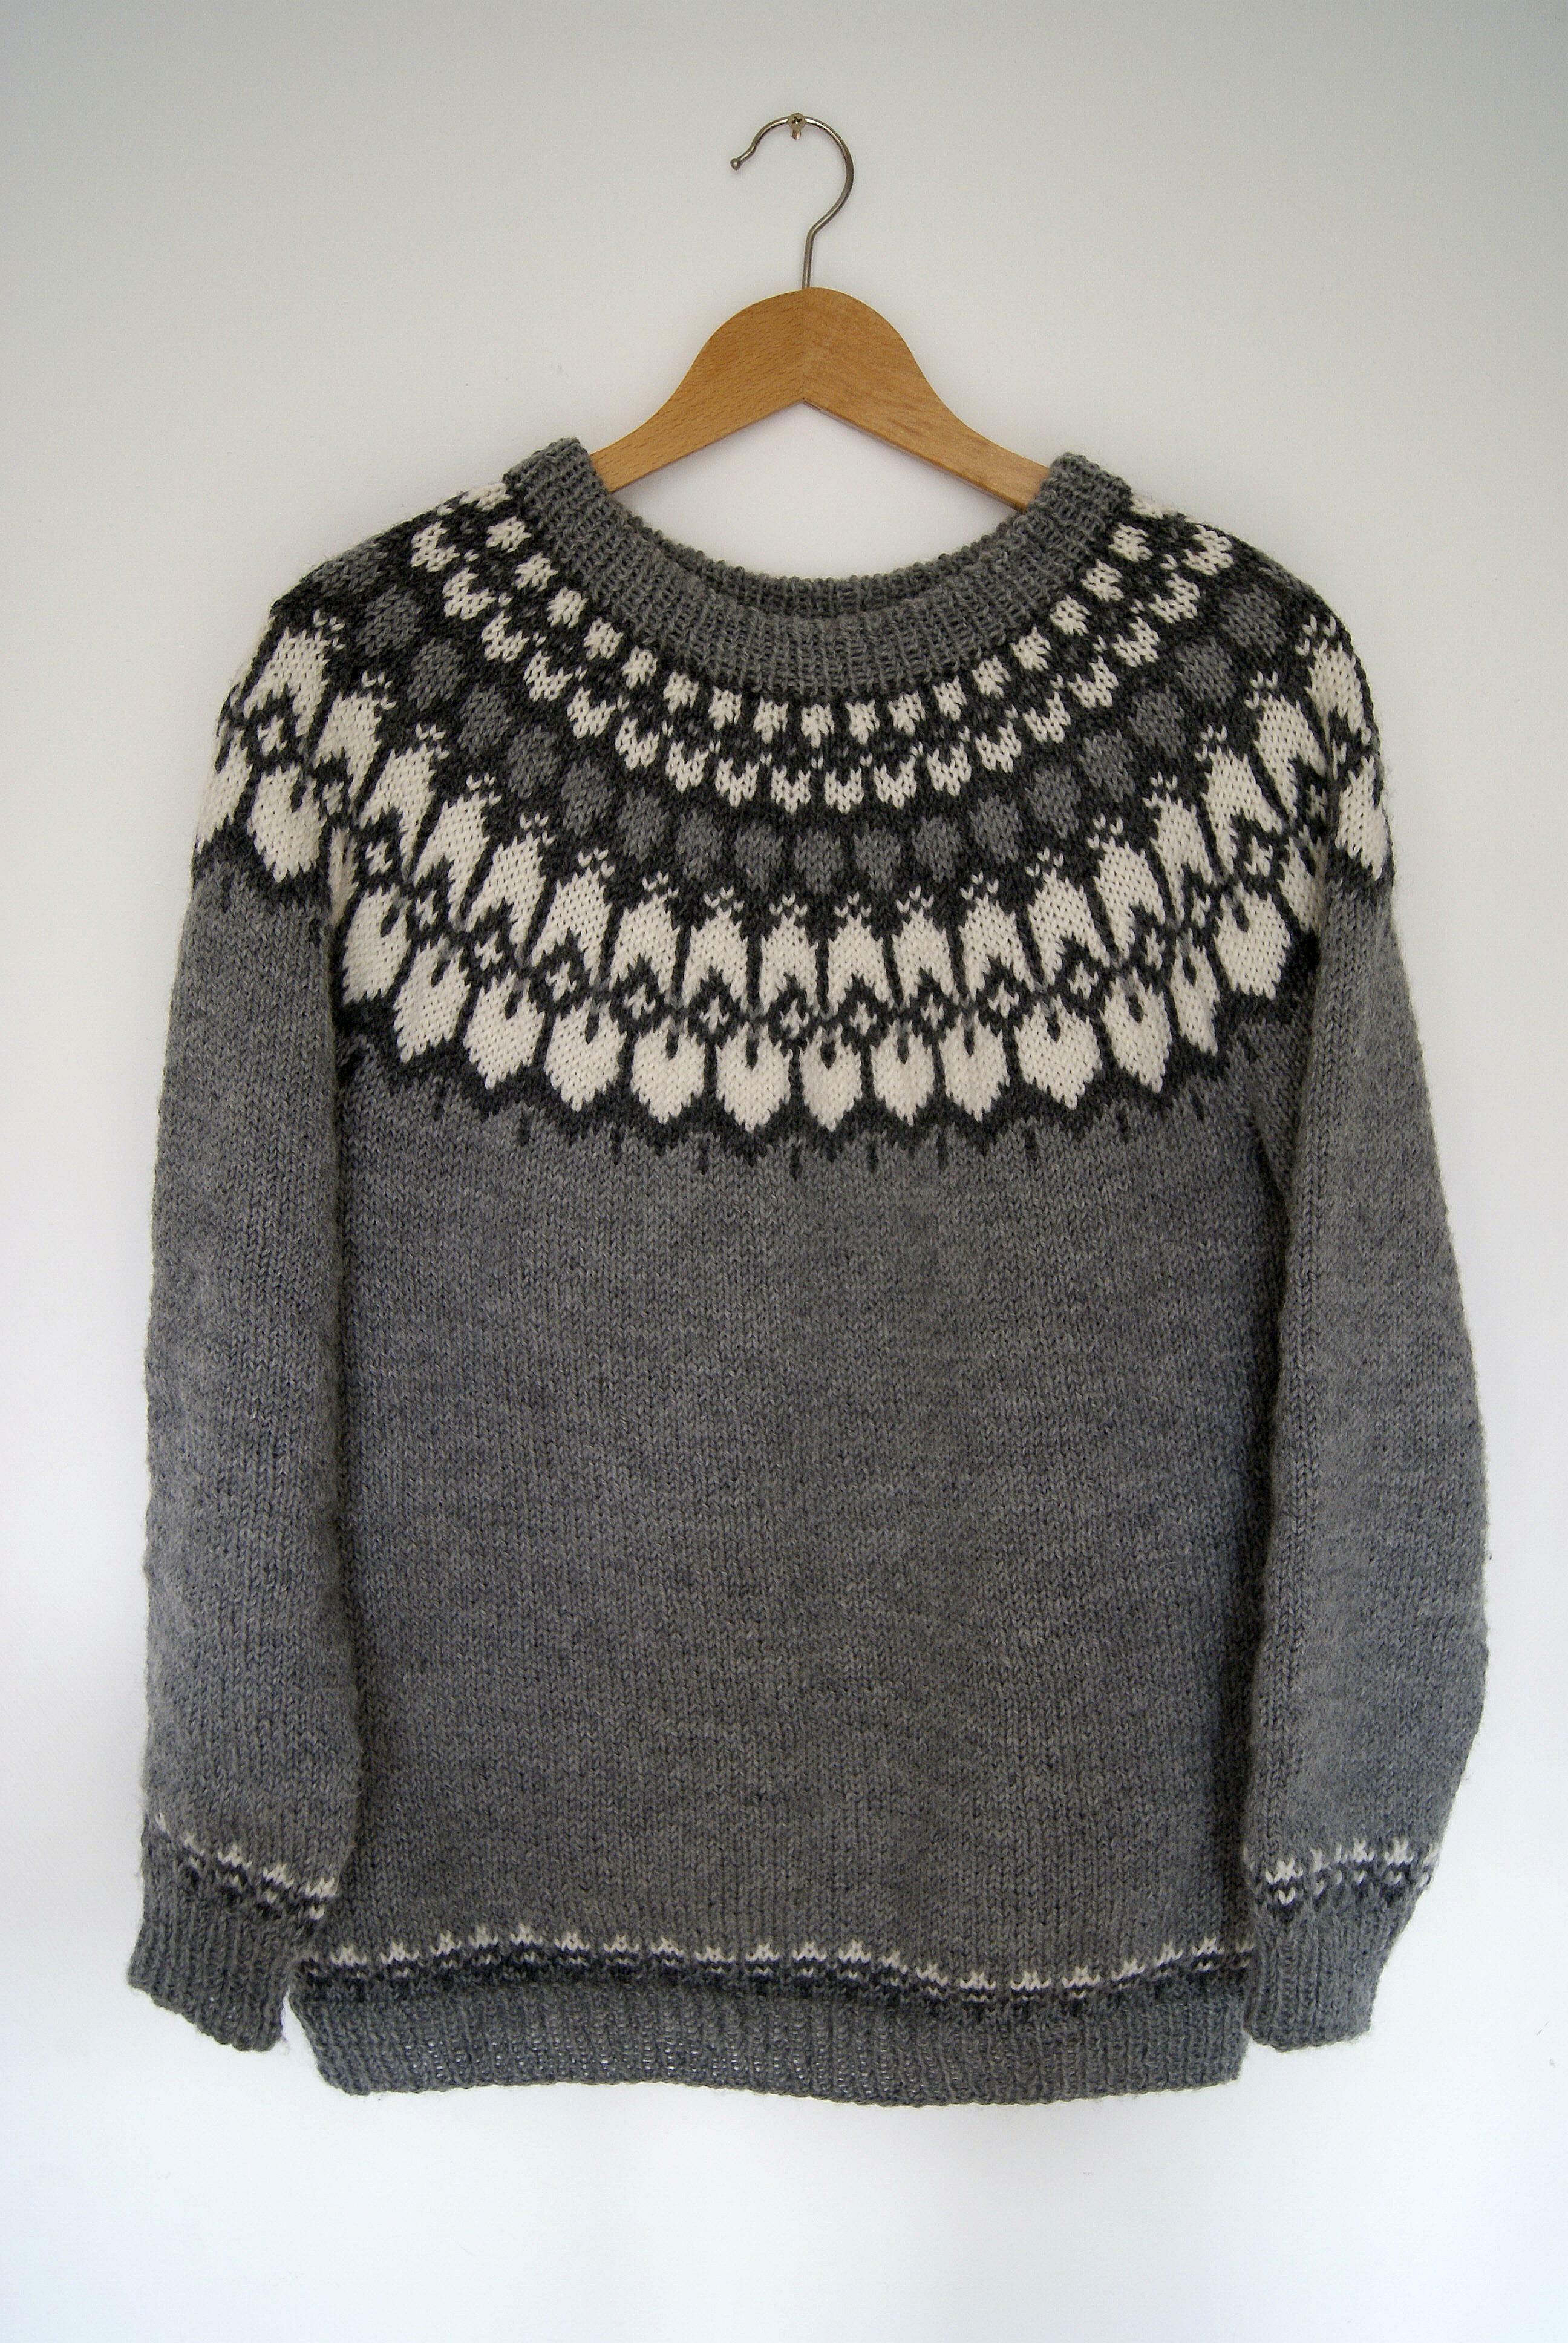 Icelandic Yoke Sweater #icelandic #knitting and #crochet